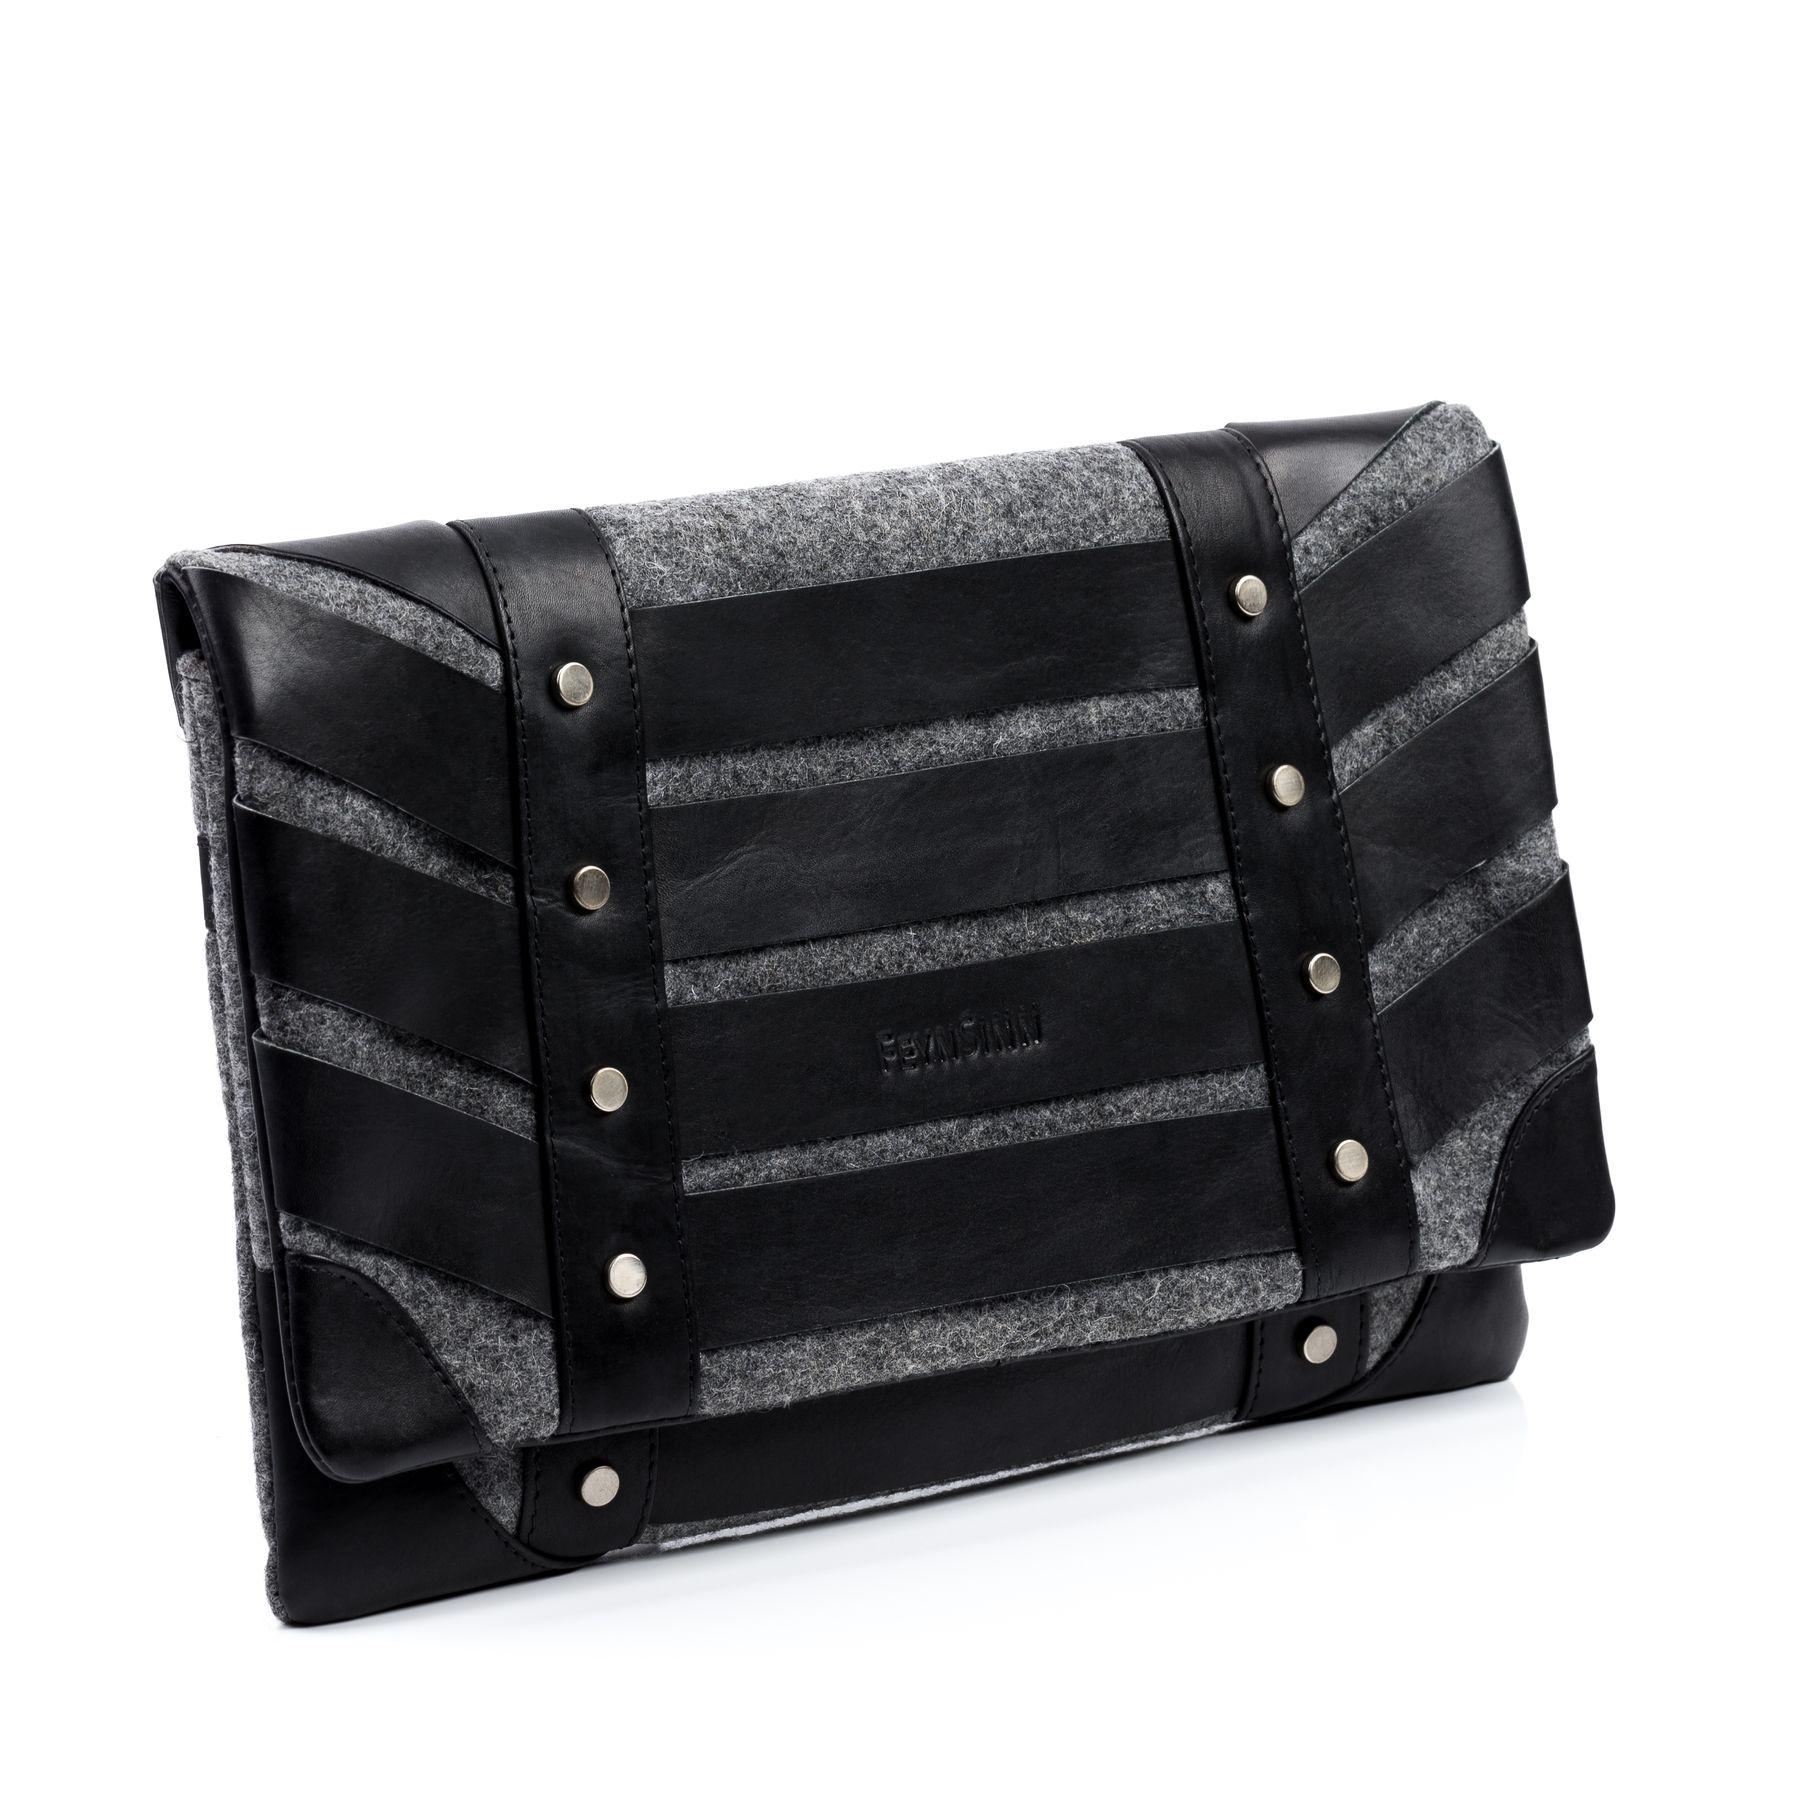 feynsinn clutch sarah ledertasche unterarmtasche leder abendtasche gro l schwarz grau. Black Bedroom Furniture Sets. Home Design Ideas